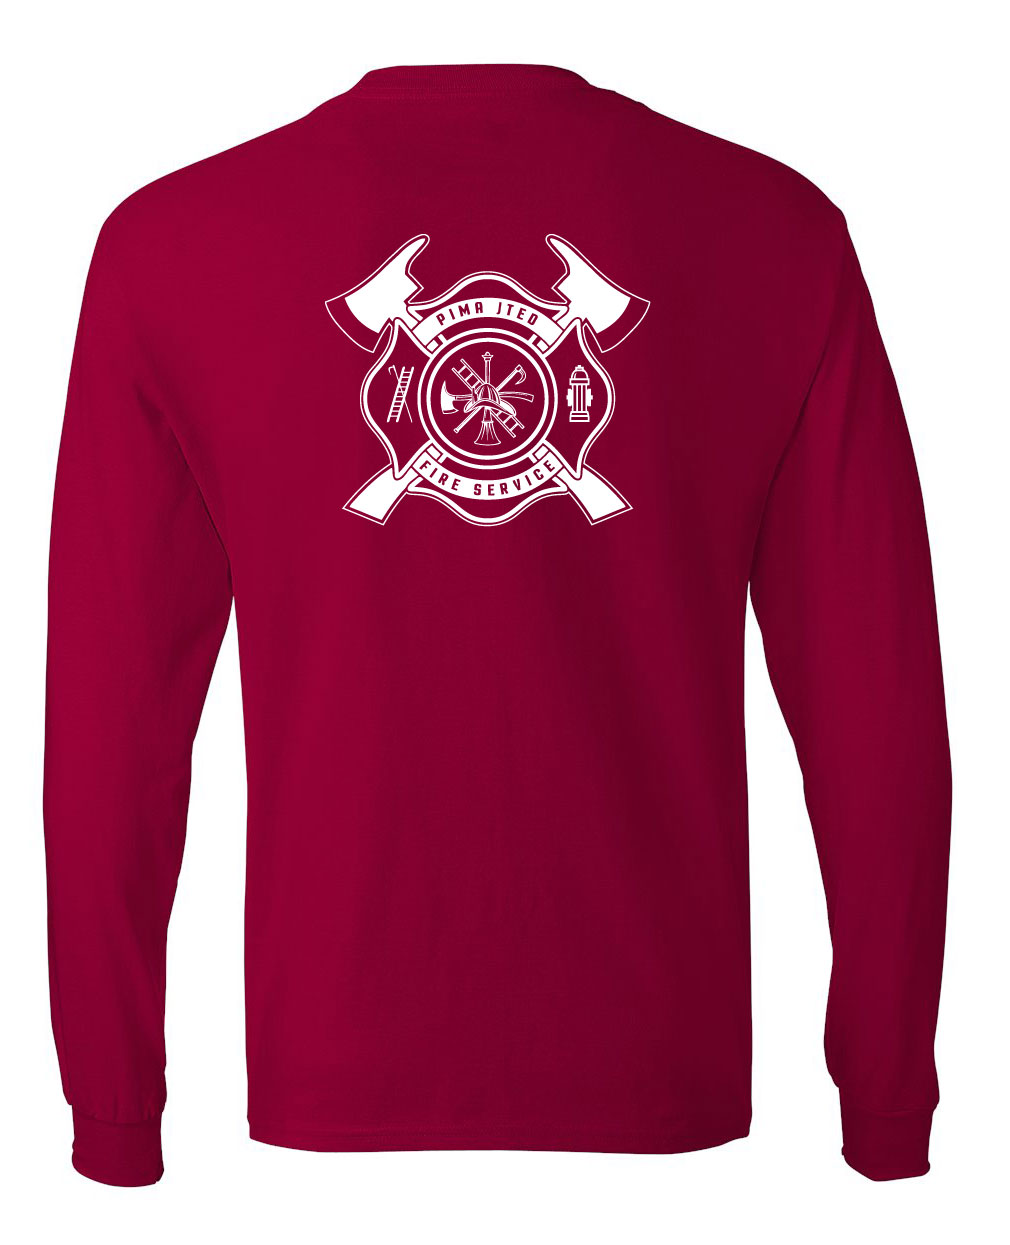 Hanes tagless comfortsoft long sleeve t shirt tee time usa for Hanes comfortsoft tagless t shirt review